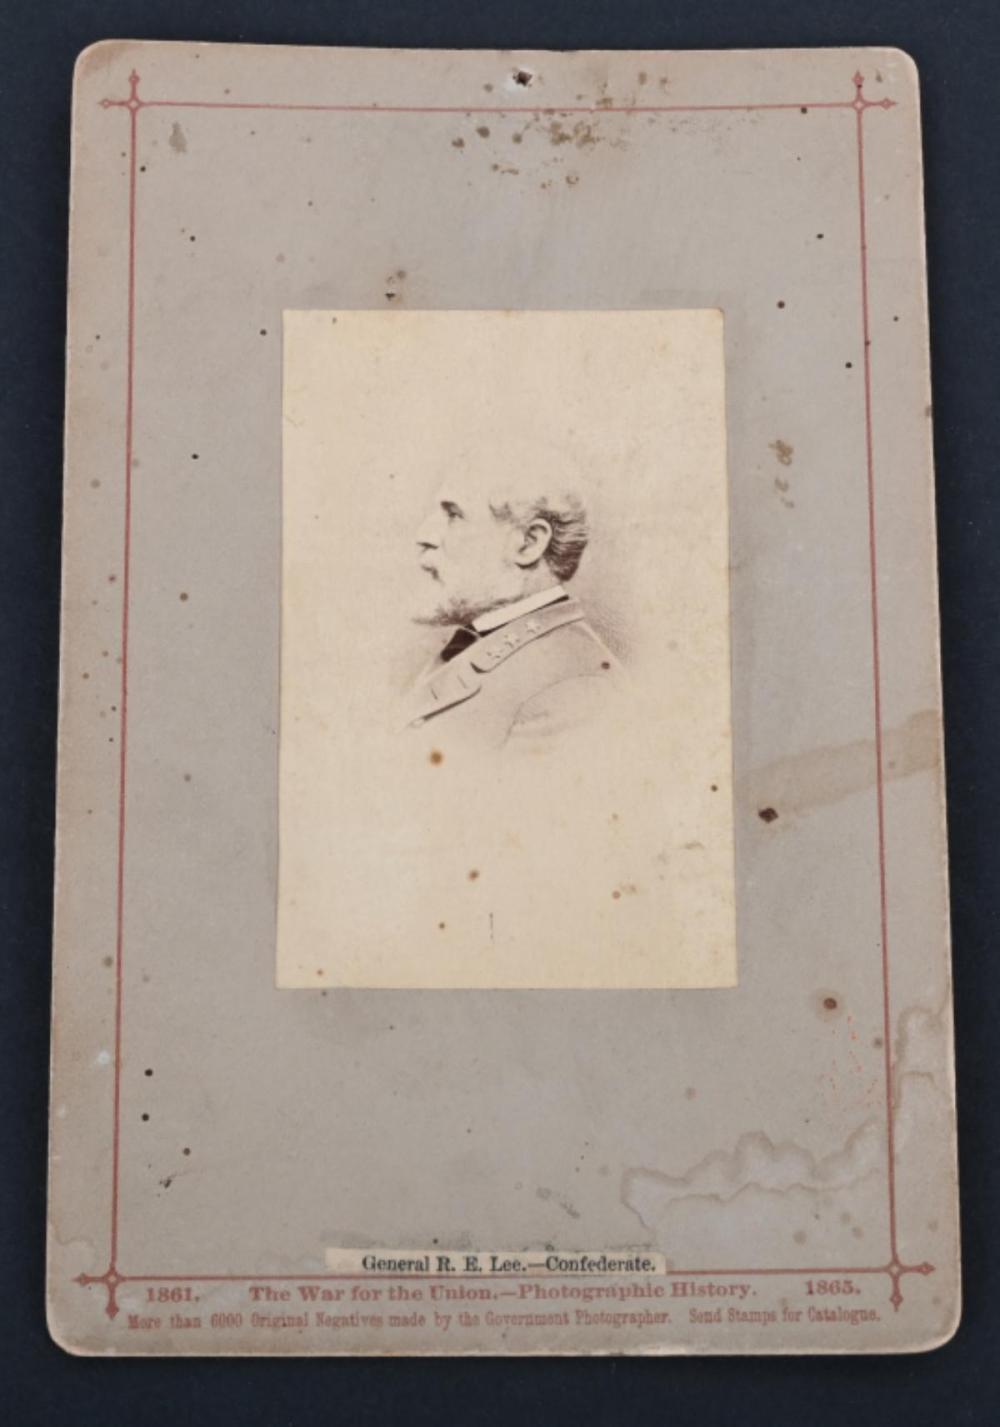 CSA GENERAL ROBERT E. LEE CABINET CARD, J. TAYLOR